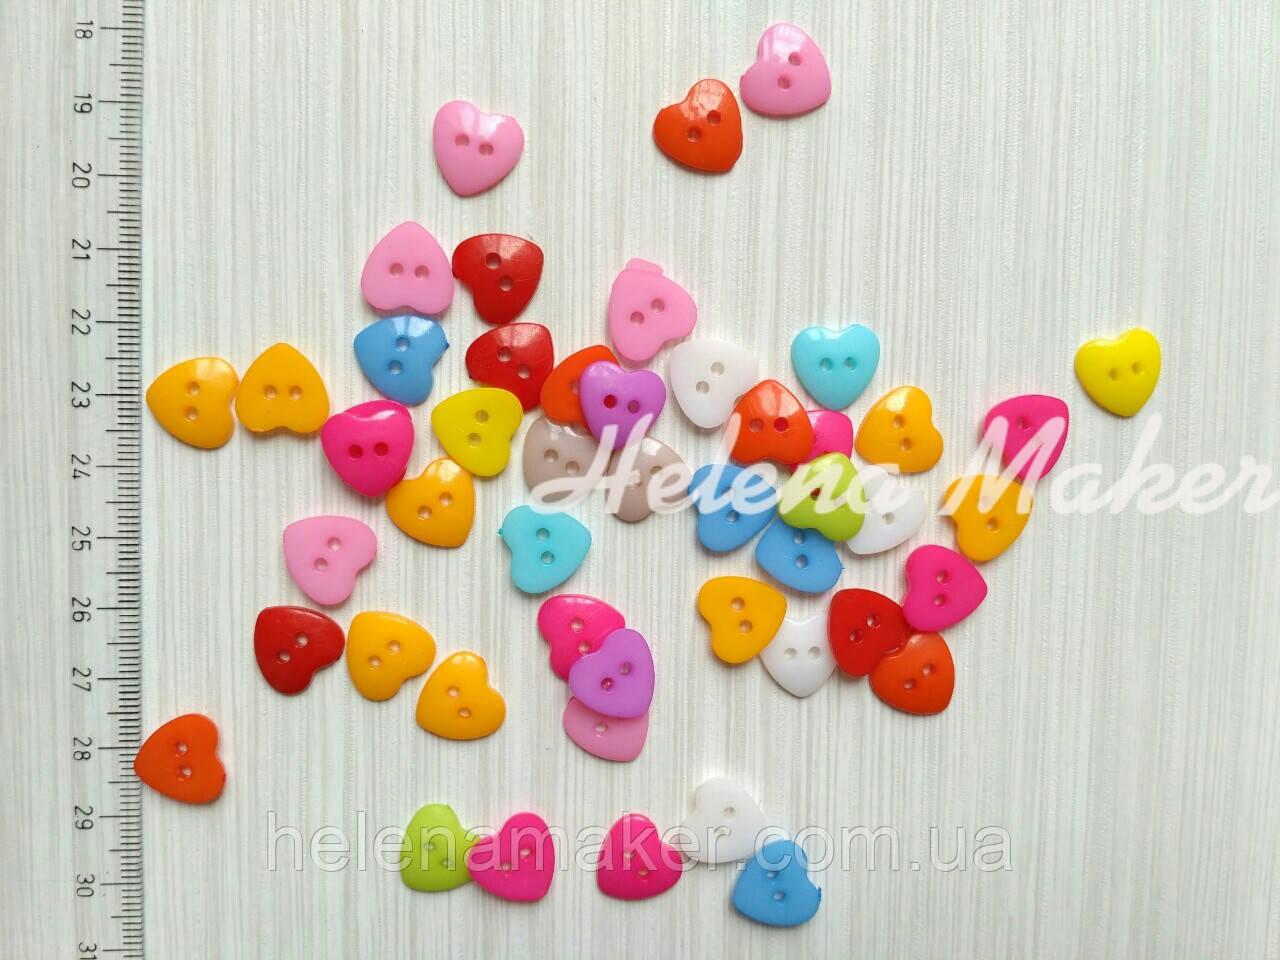 Набор пластиковых пуговиц Сердце 10 шт 13 мм